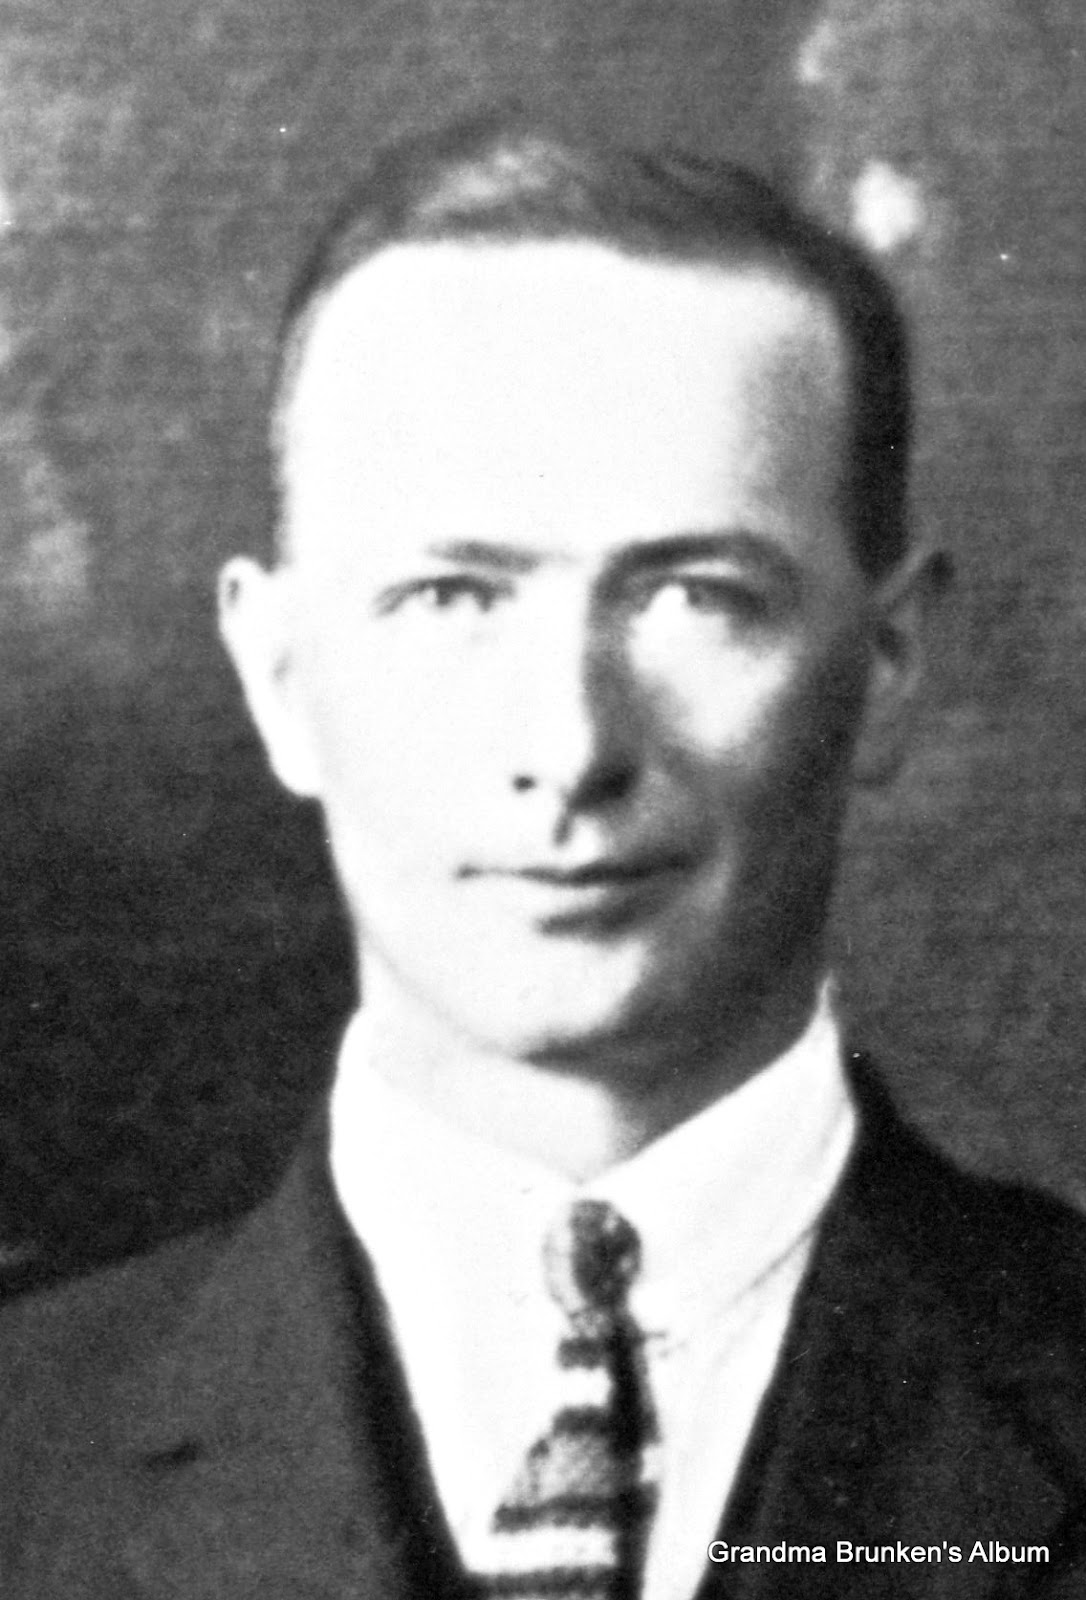 Emil Herman Brunken